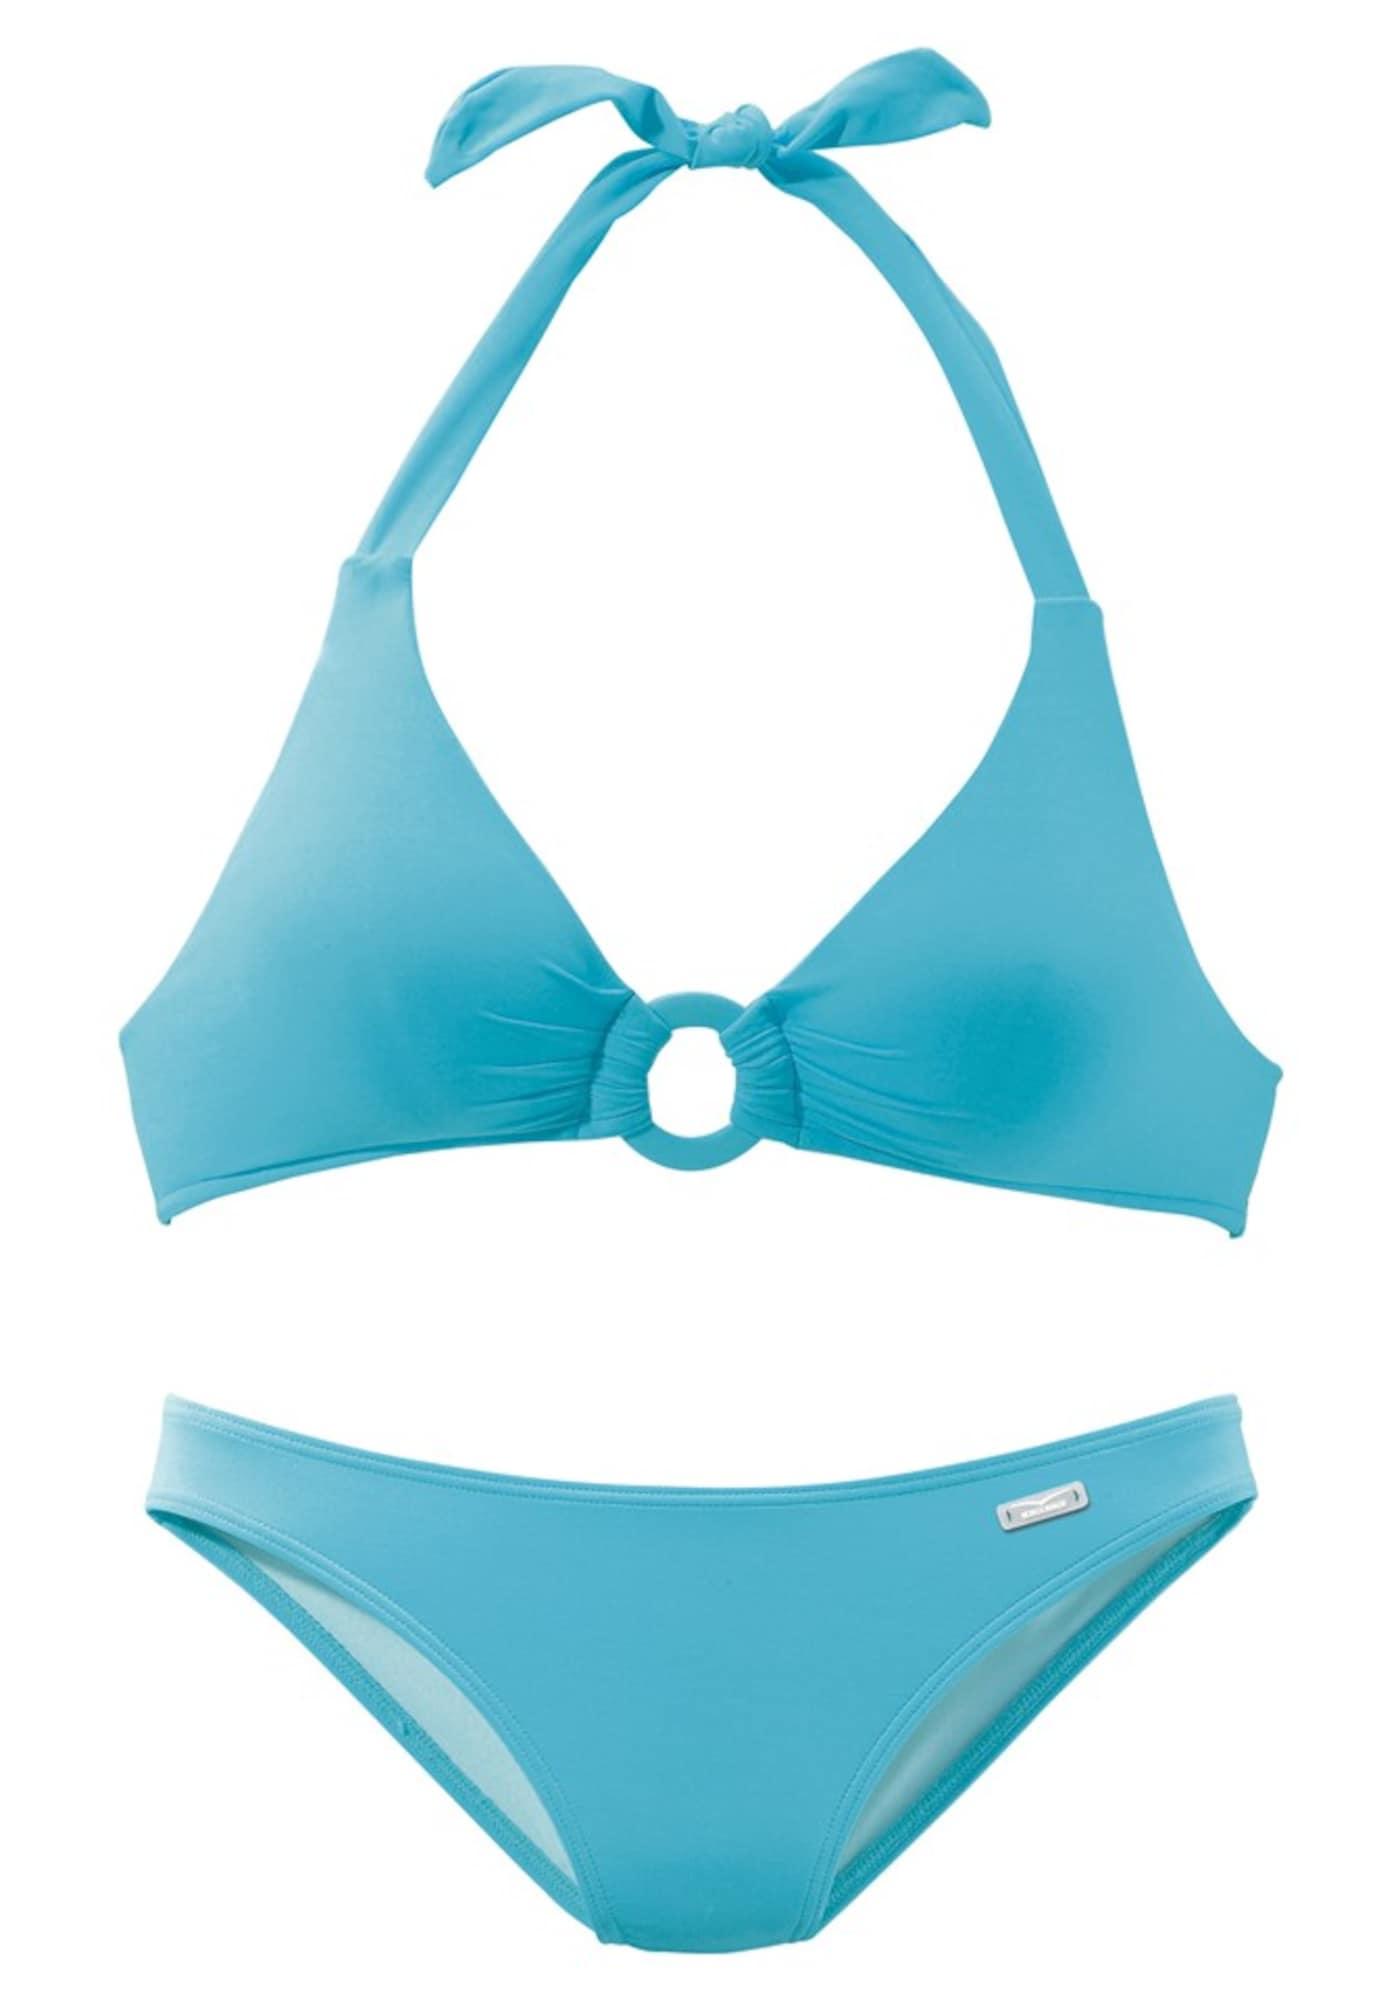 Bikiny aqua modrá světlemodrá VENICE BEACH